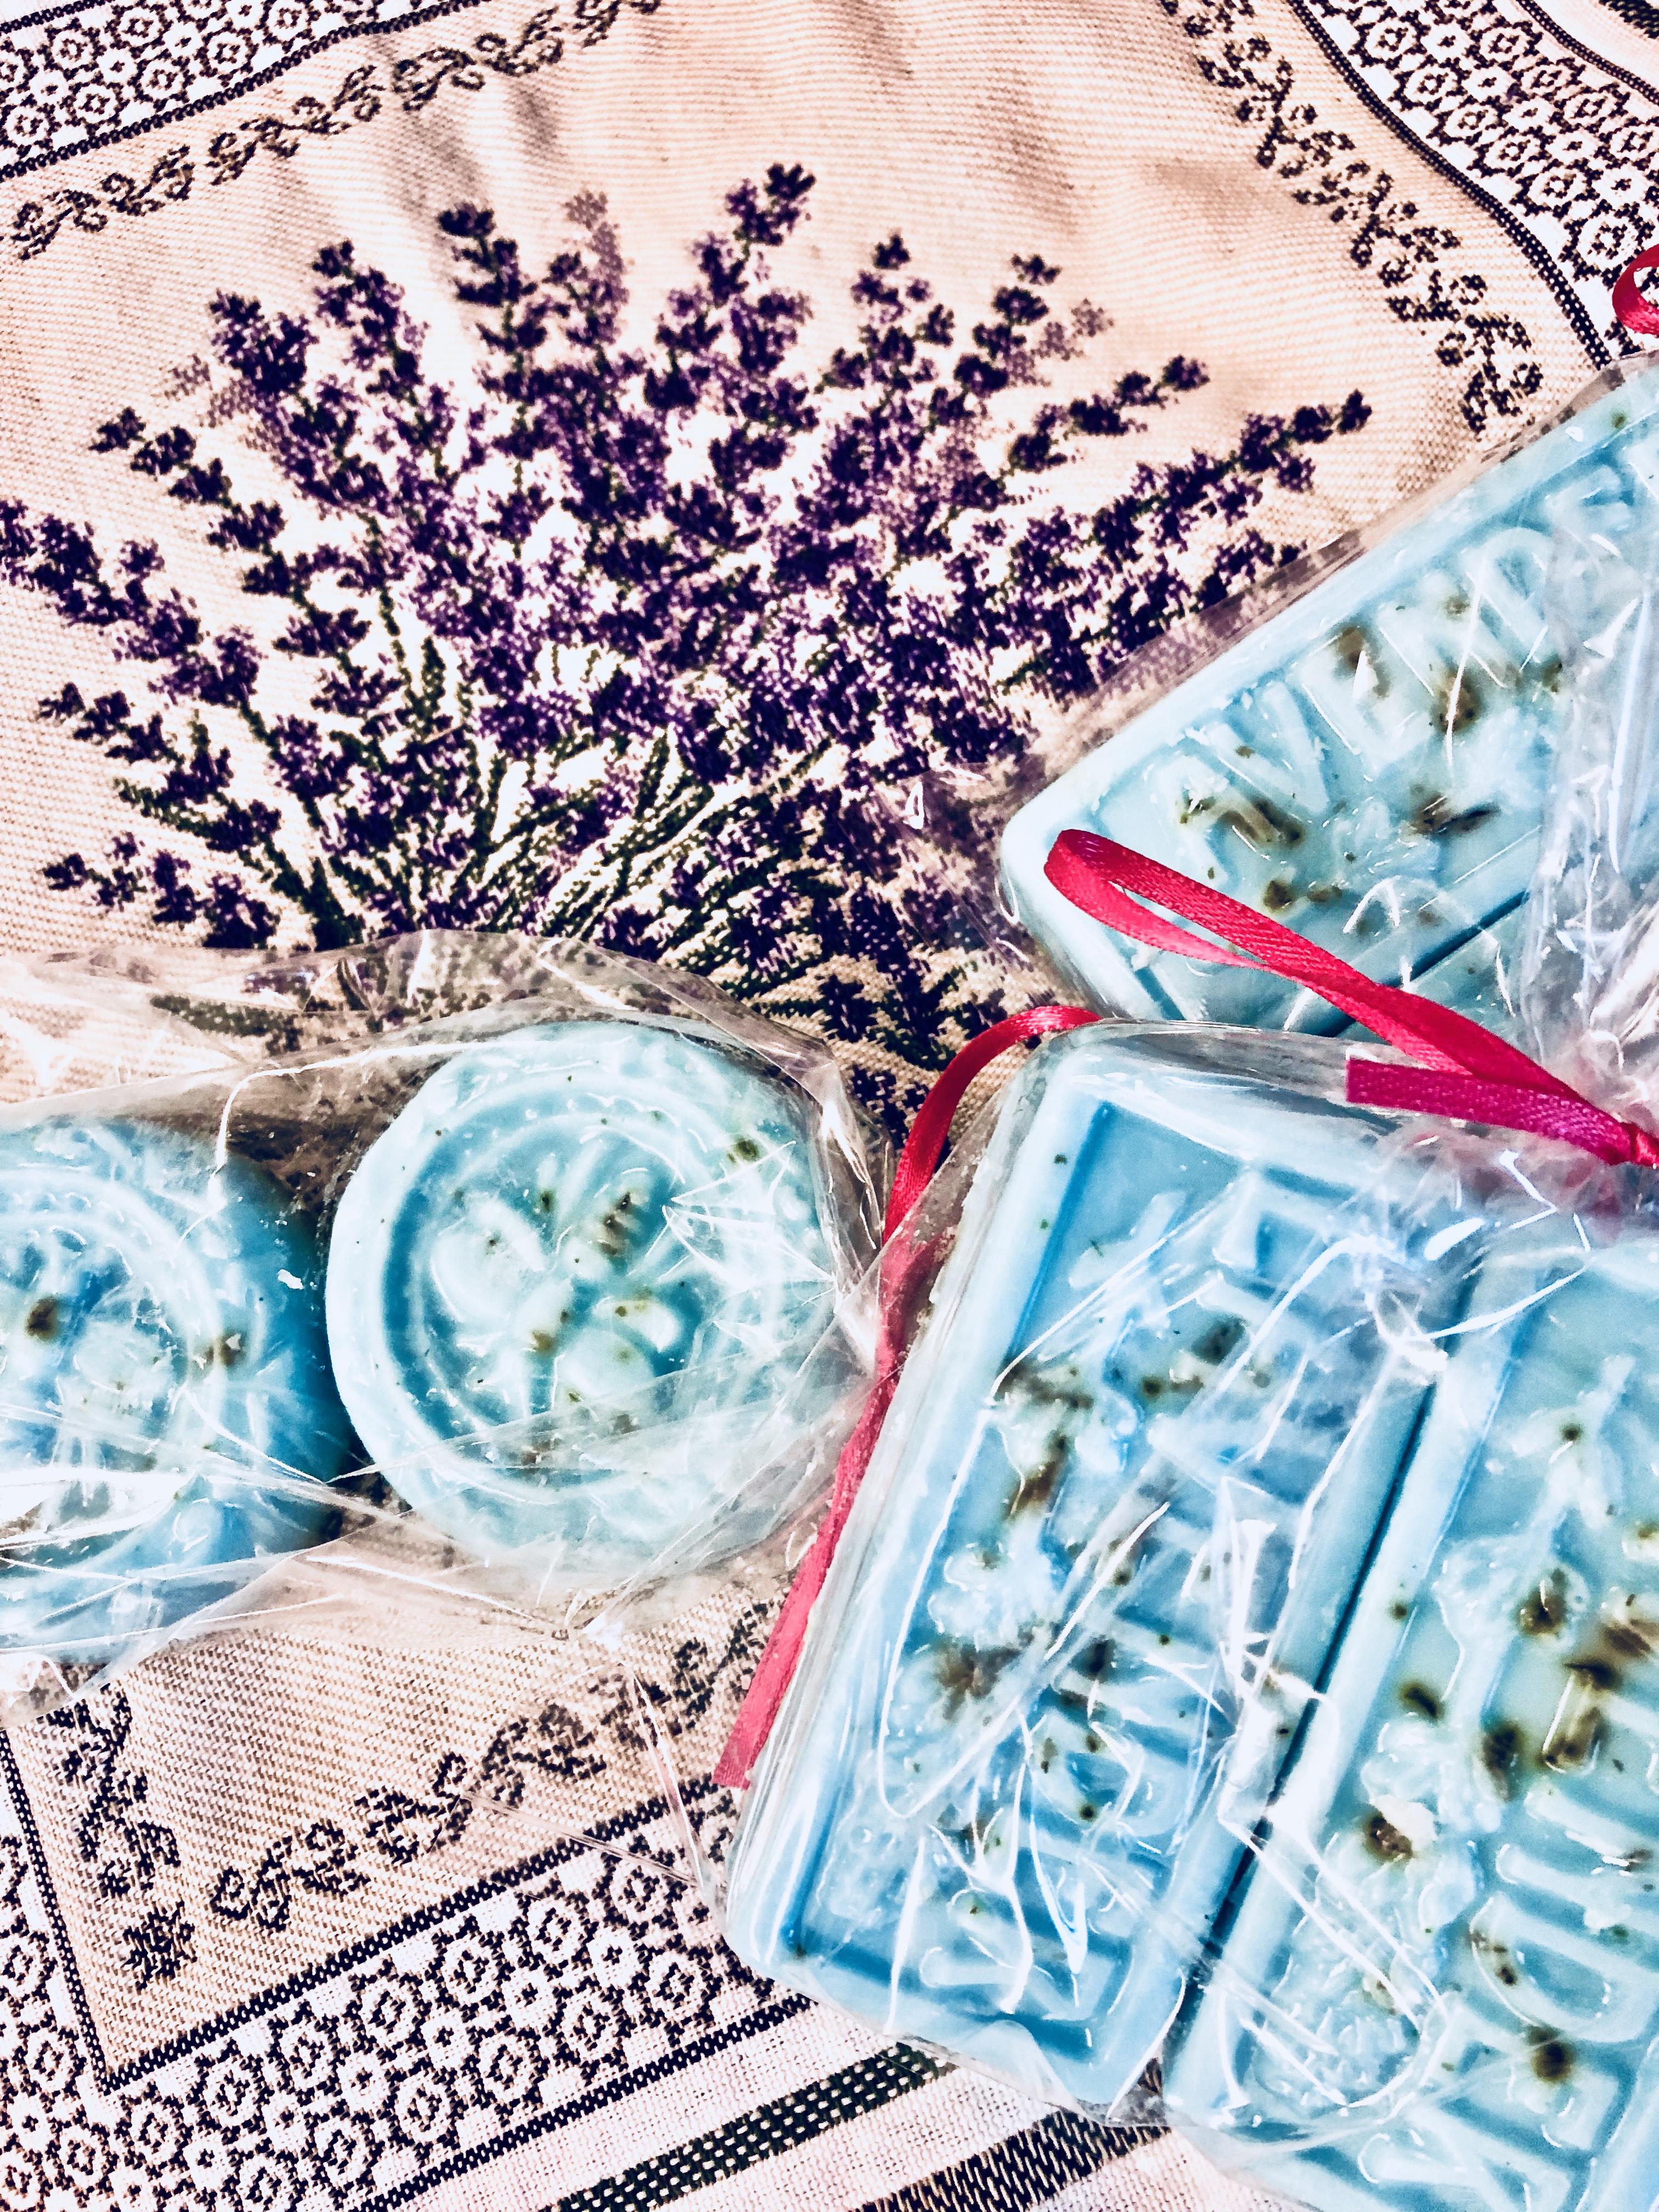 Lavender flower soaps